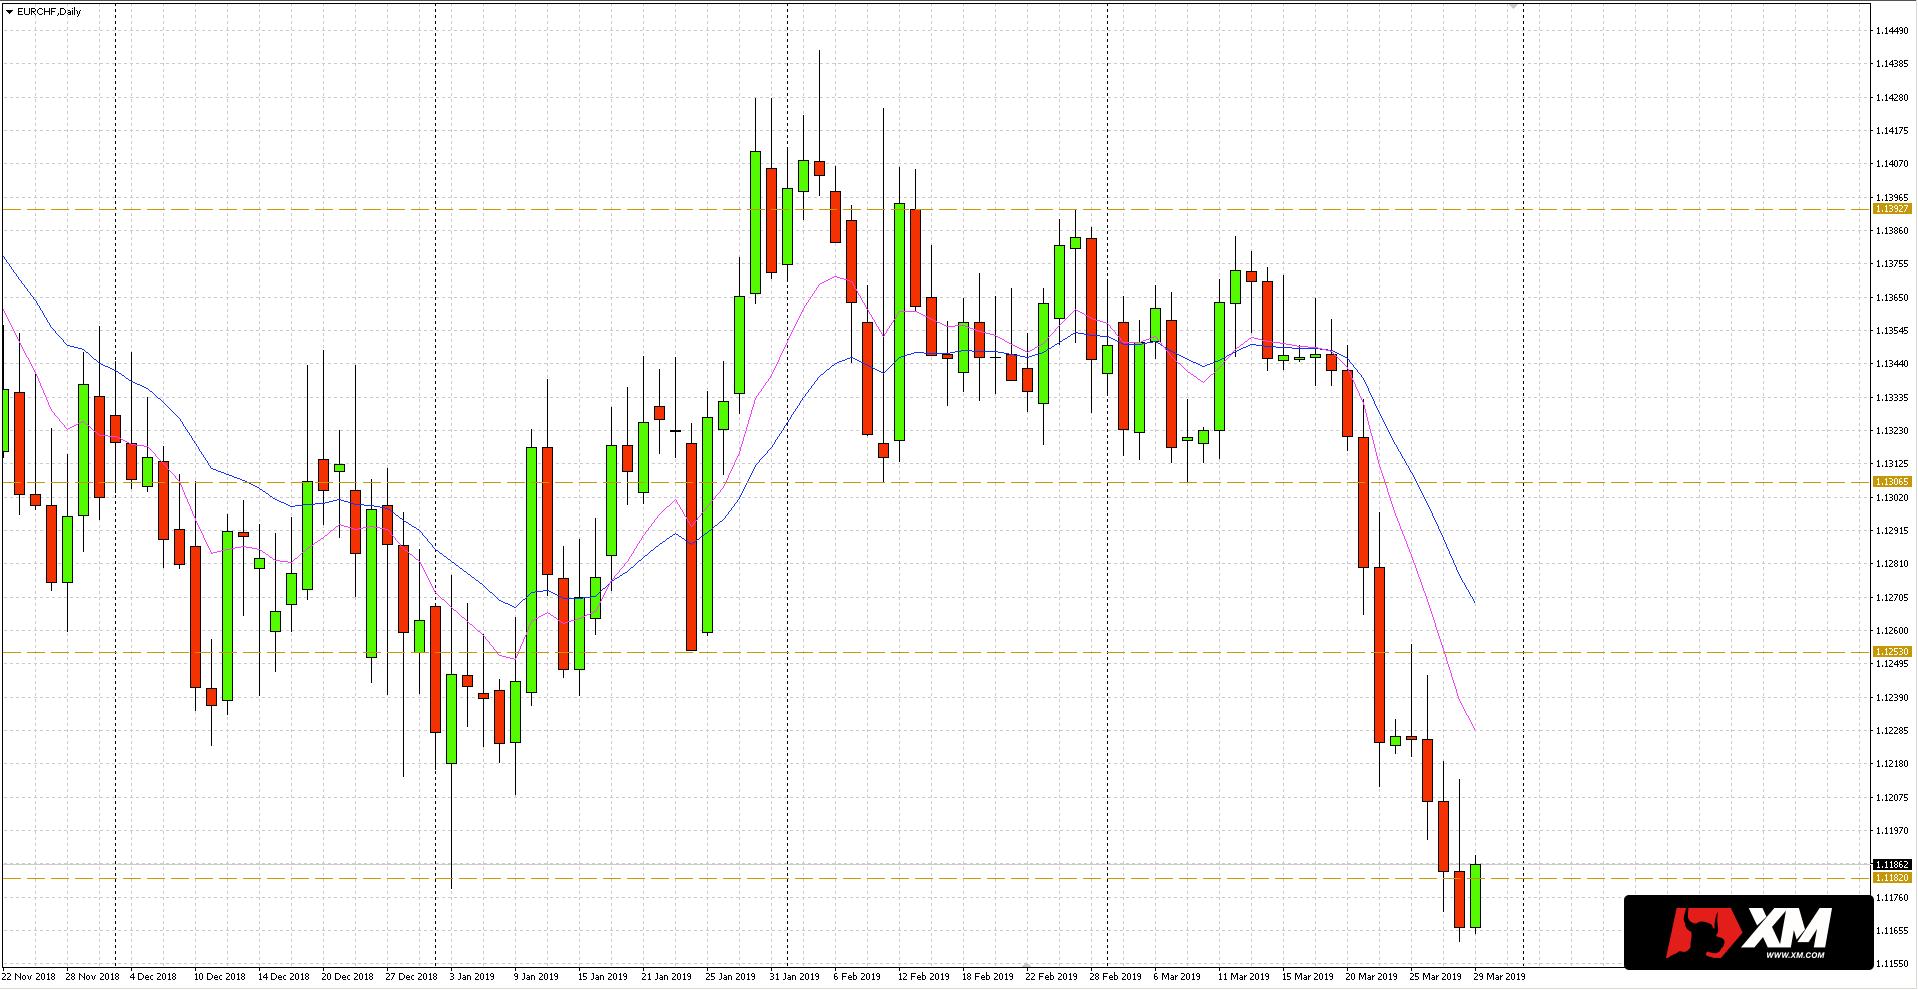 EUR/CHF - wykres dzienny - 29 marca 2019